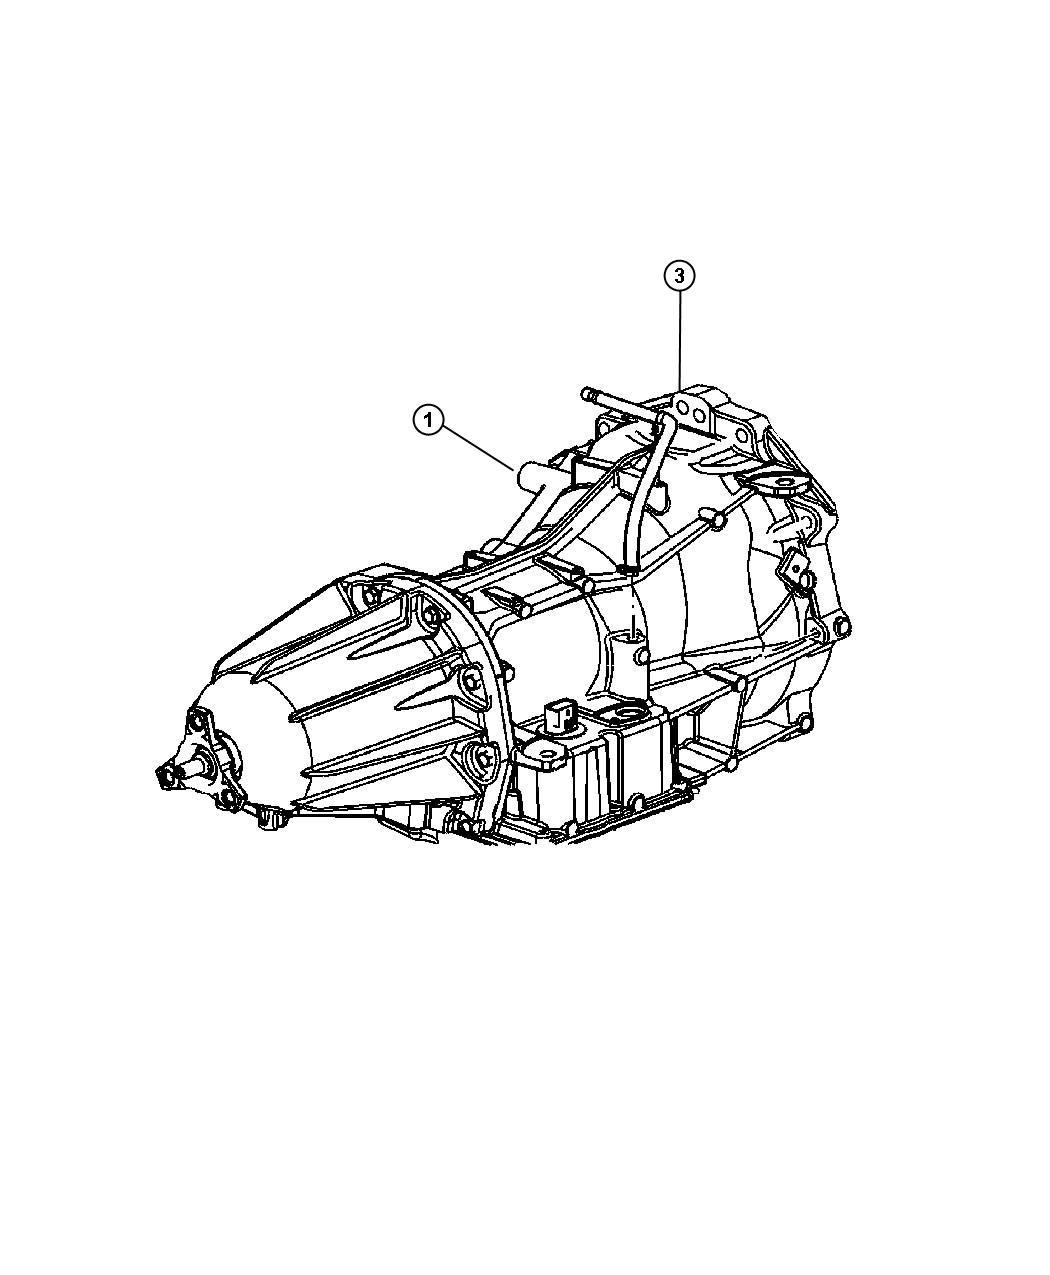 Chrysler 300 Transmission kit, transmission package. With